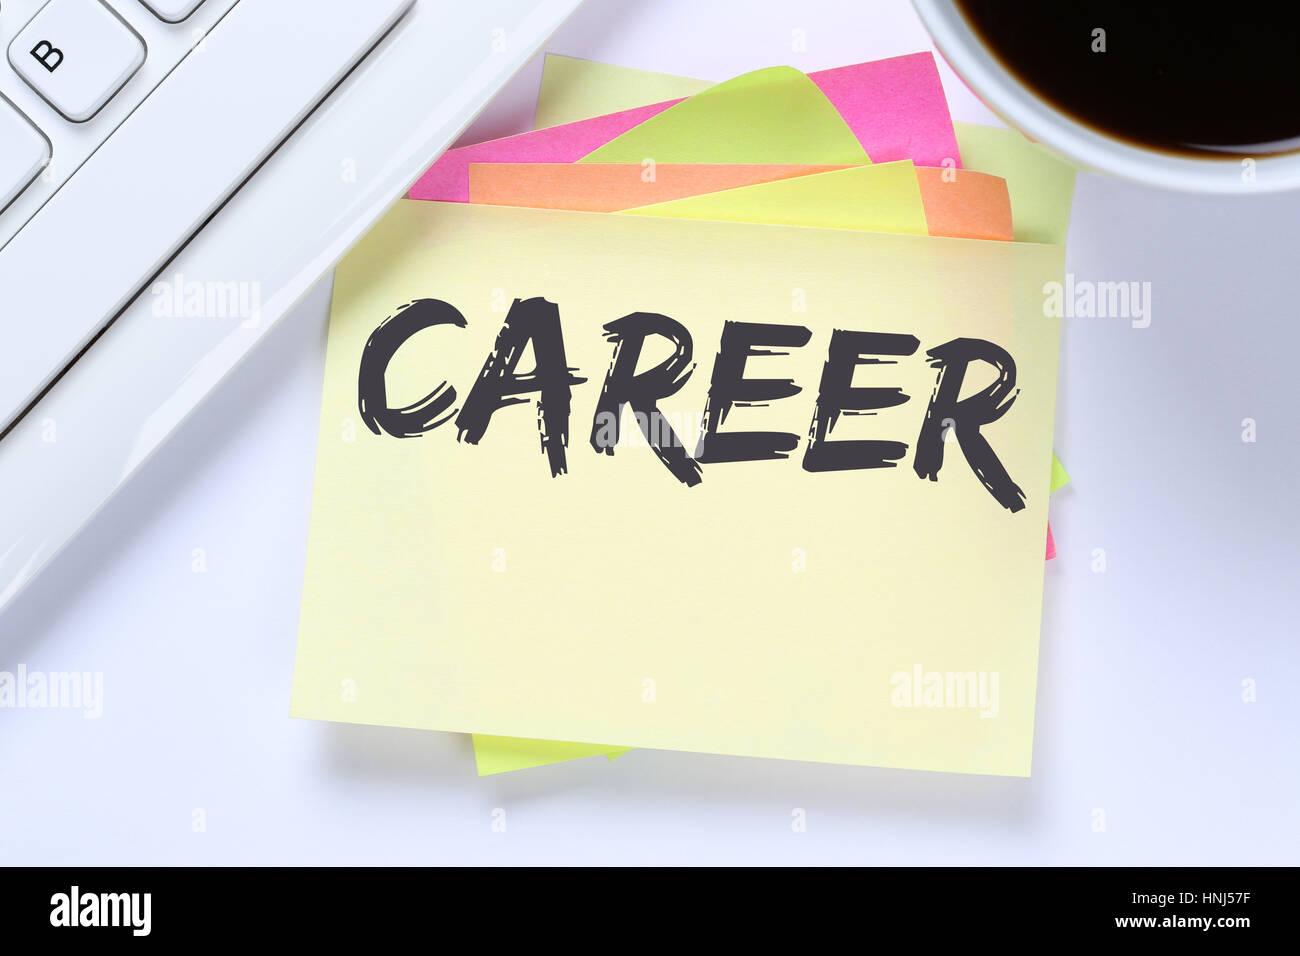 Career opportunities goals success and development business desk computer keyboard Stock Photo